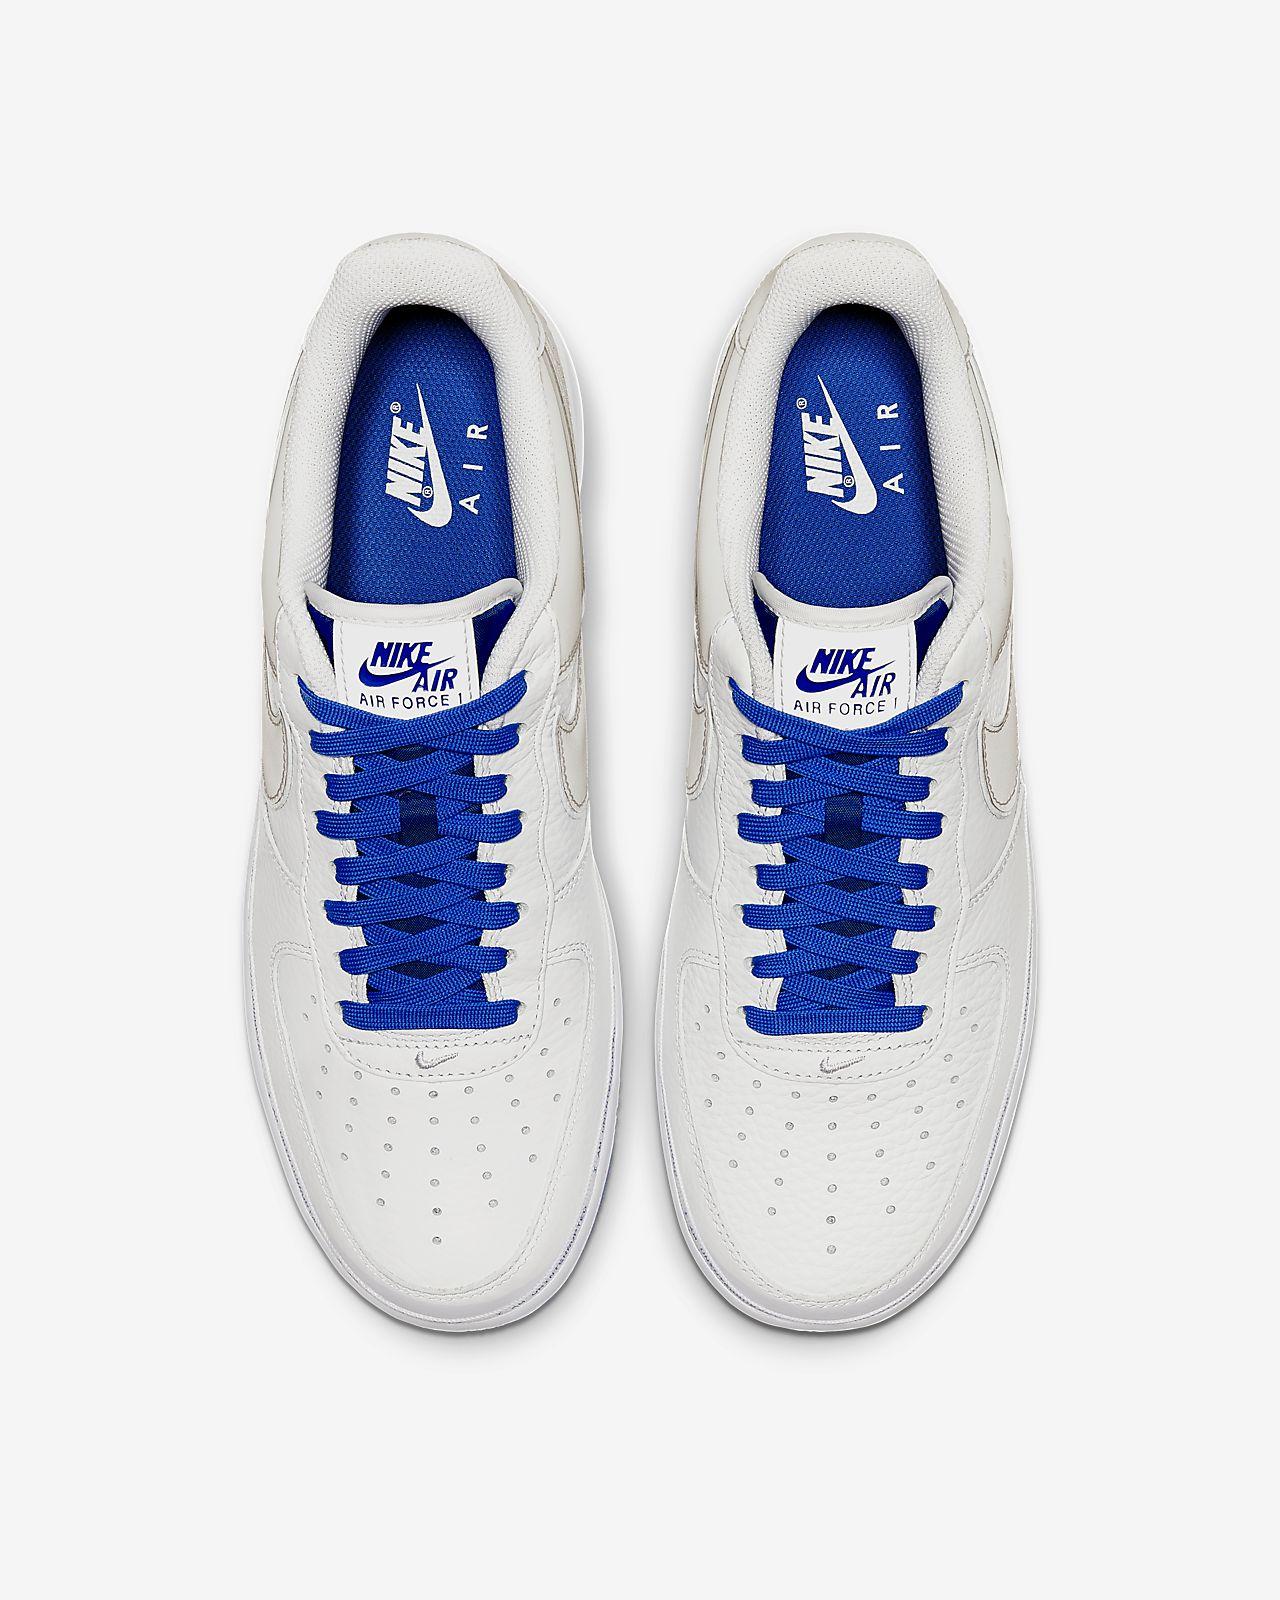 Nike Air Force 1 '07 More Than ____ Men's Shoe